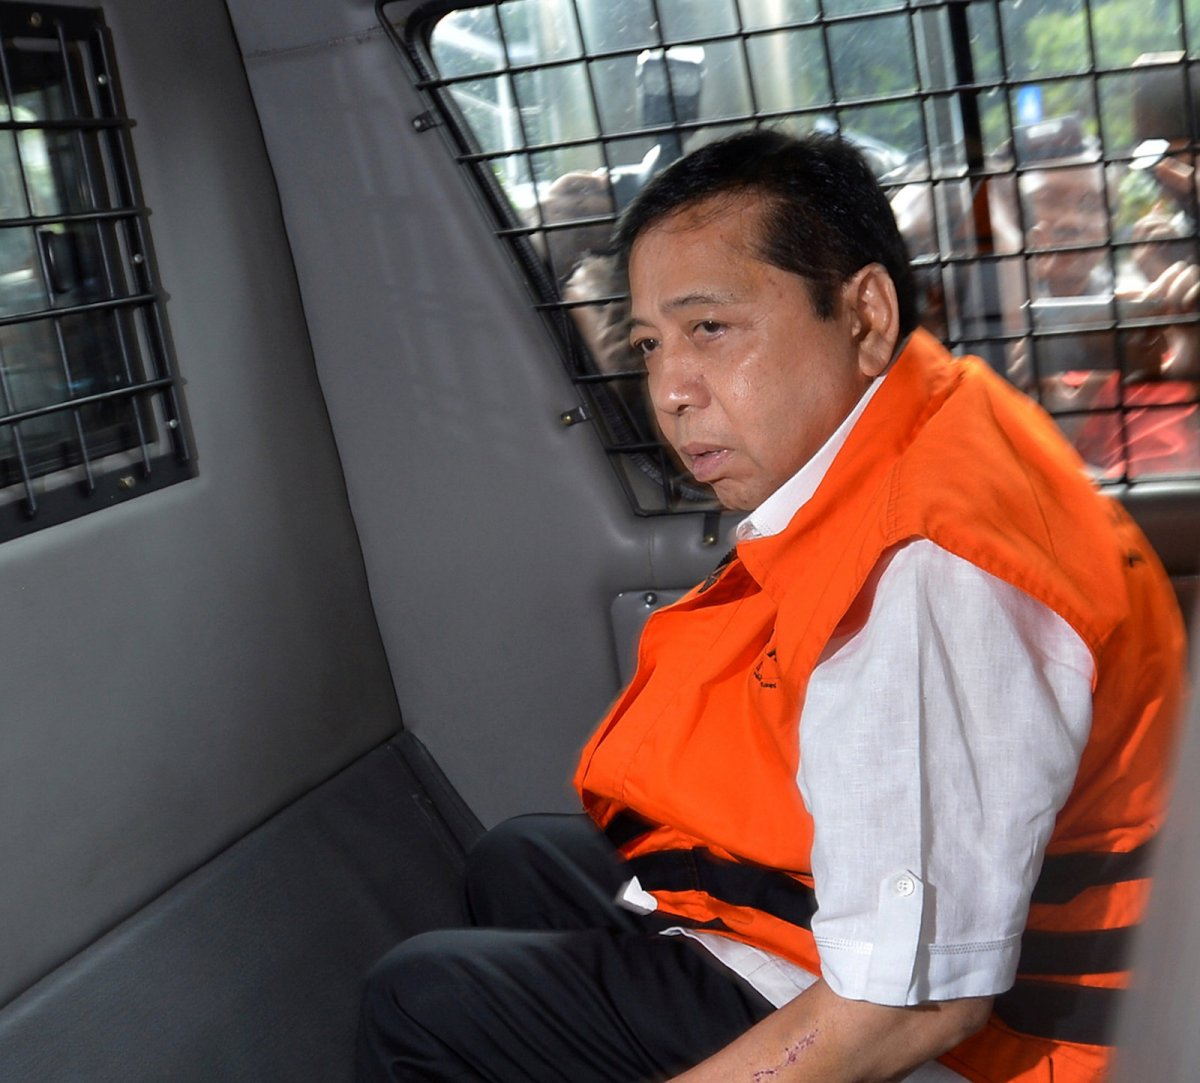 Indonesian parliament speaker Setya Novanto, is escorted from the Corruption Eradication Commission (KPK) building in Jakarta, Indonesia November 21, 2017. Photo: Antara Foto via Reuters/Wahyu Putro